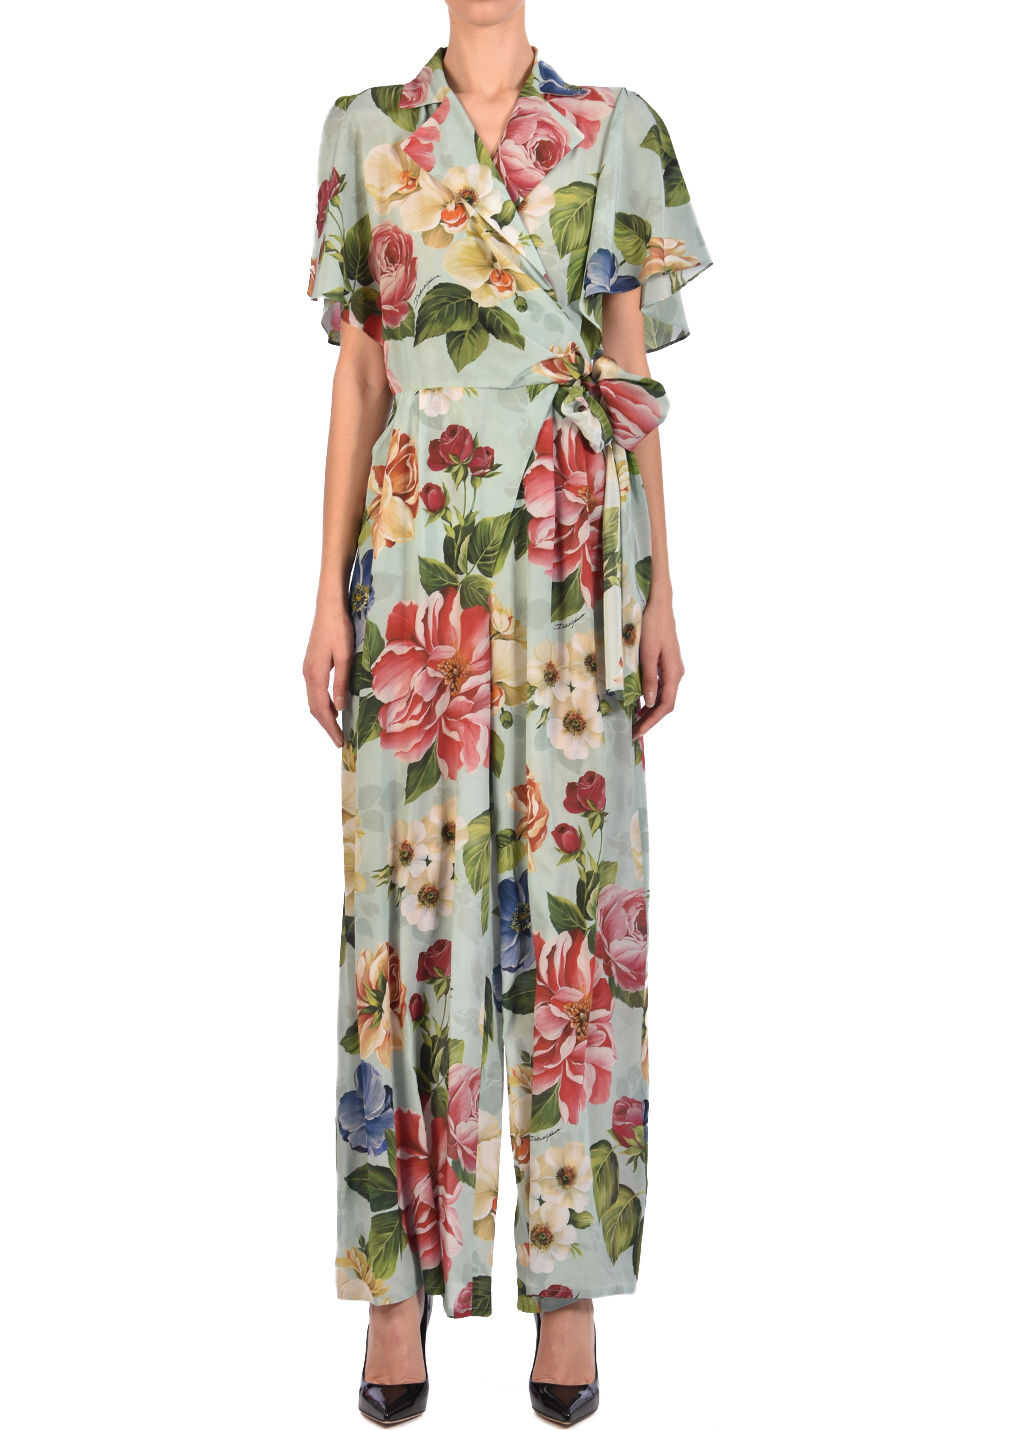 Dolce & Gabbana Floral Silk Jumpsuit Light blue